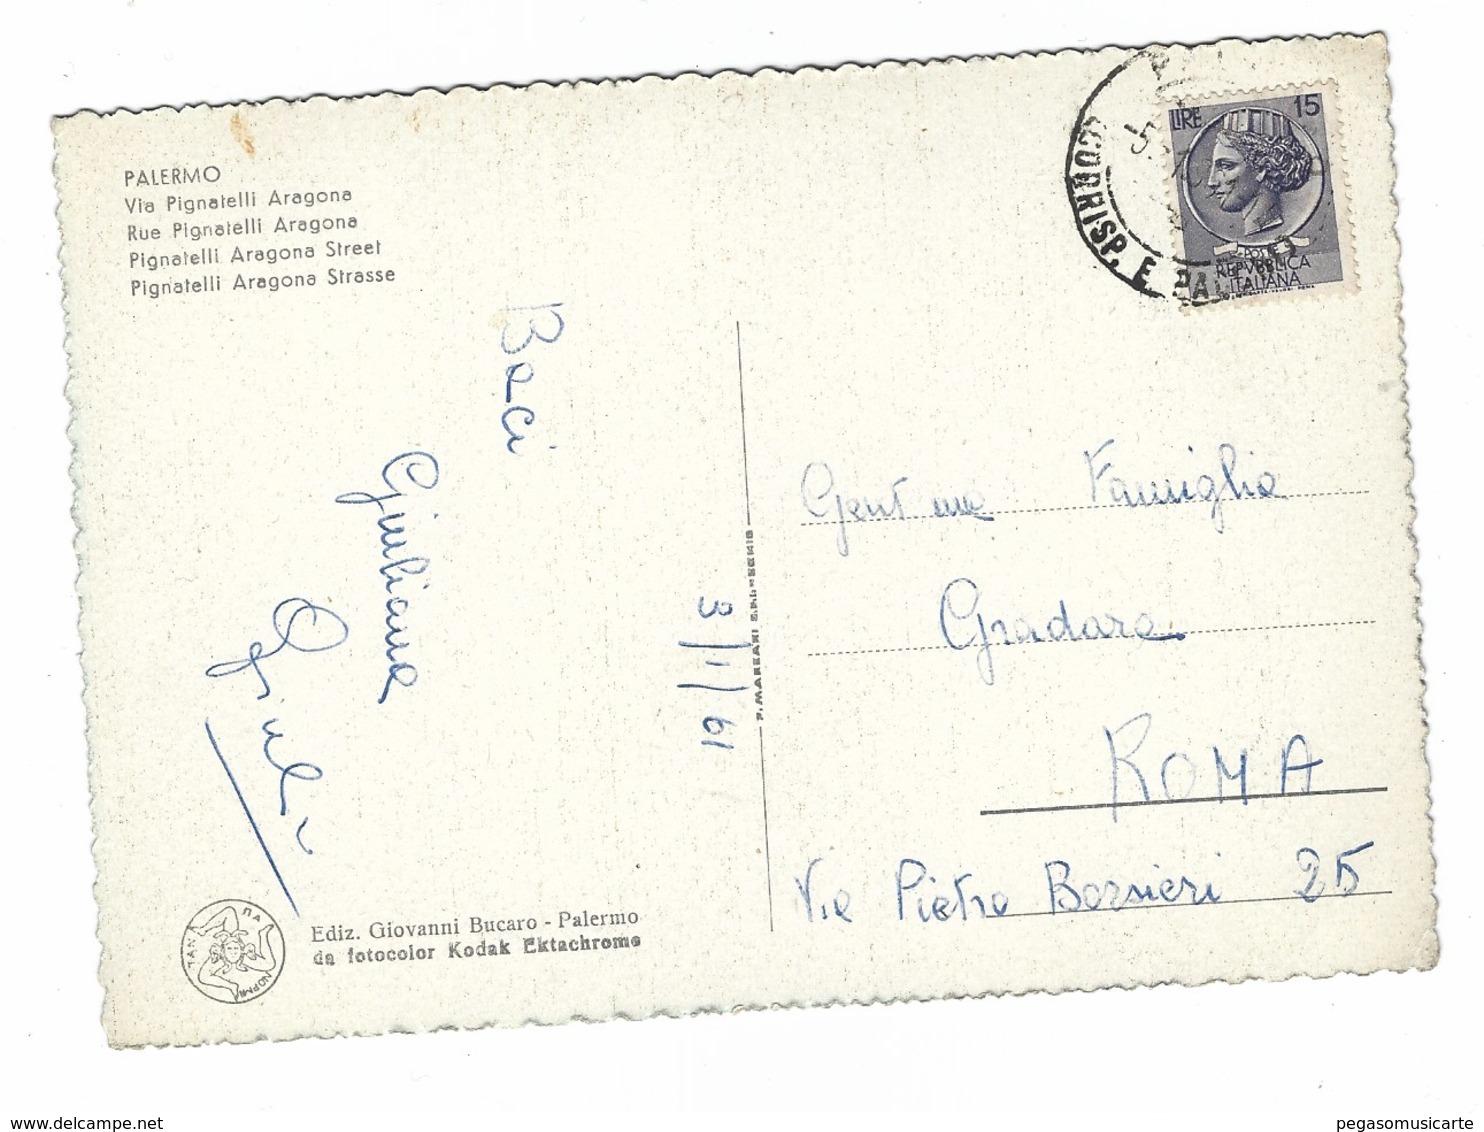 2902 - PALERMO VIA PIGNATELLI ARAGONA 1961 - Palermo